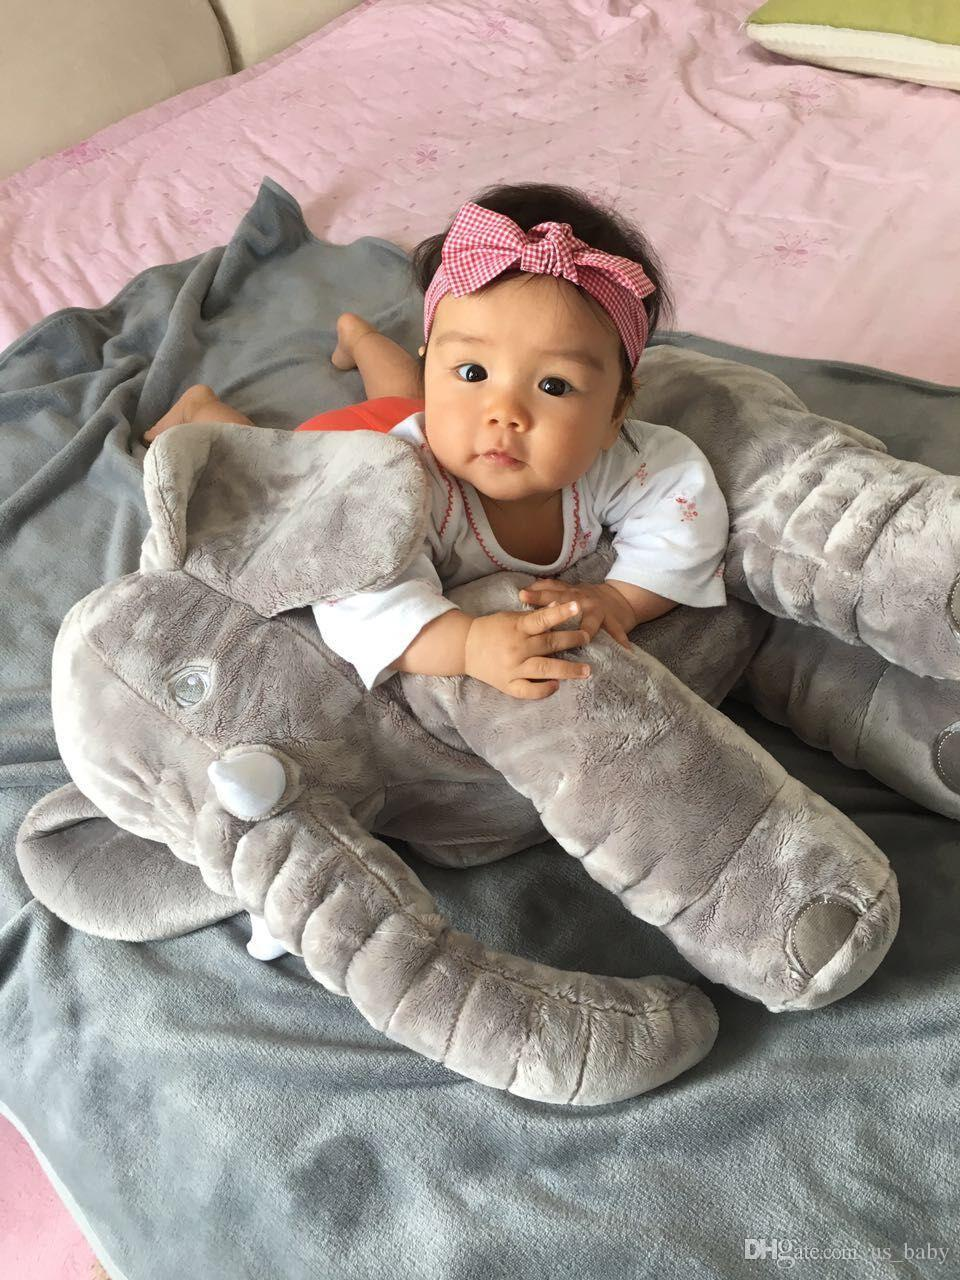 Baby Elephant Pillow Plus Animals Toys Lovely Soft Plush Dolls Baby Safe High Quality Sleep Calm Toys Room Bed Decoration Plush Toys